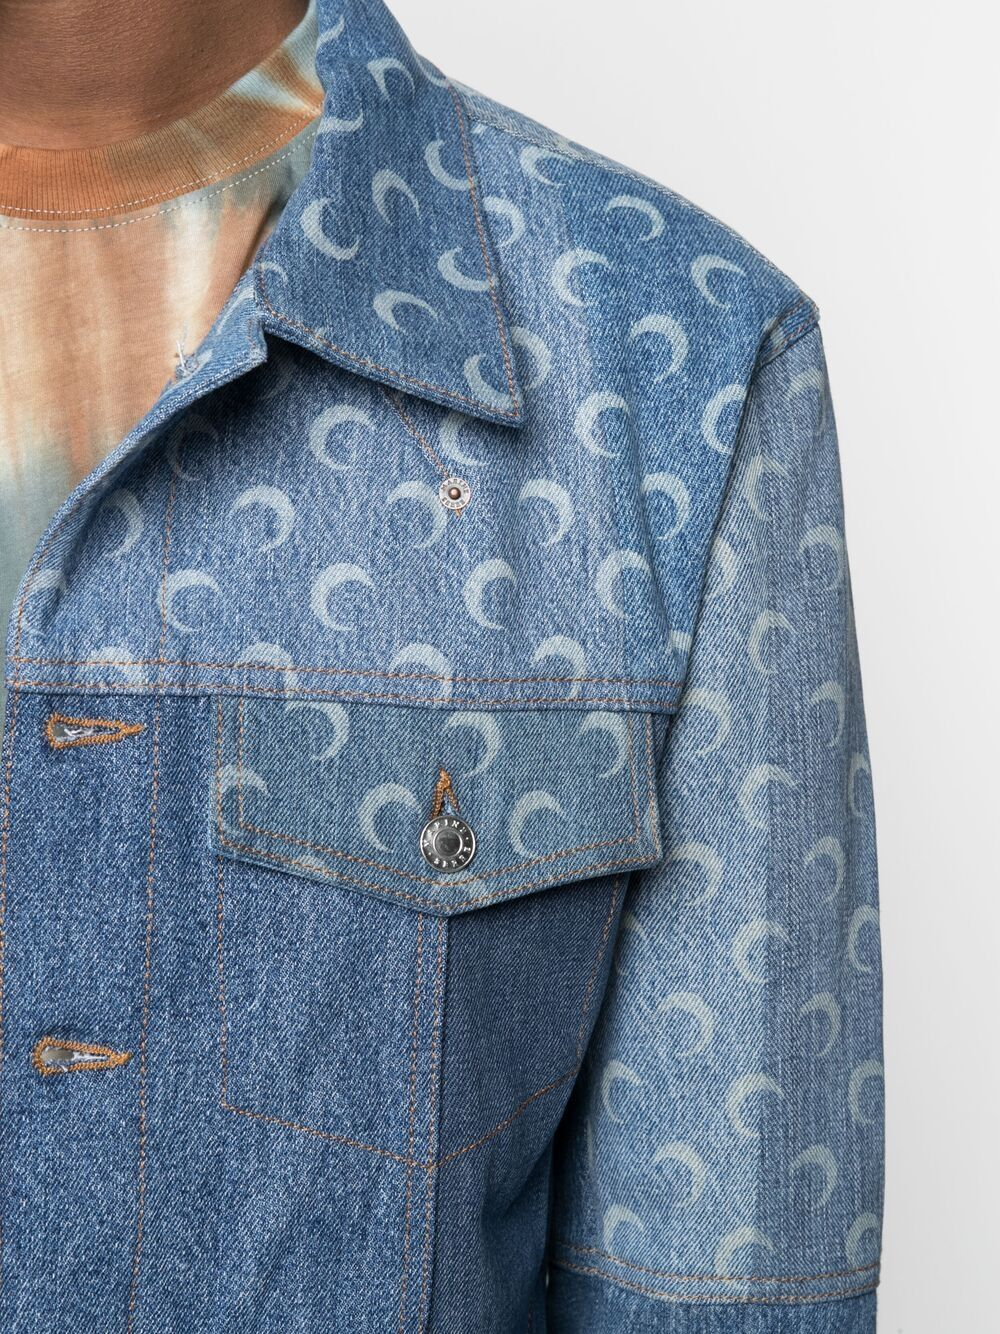 Marine Serre giacca con stampa luna uomo MARINE SERRE | Giacche | J037SS21MU-DENCO000406